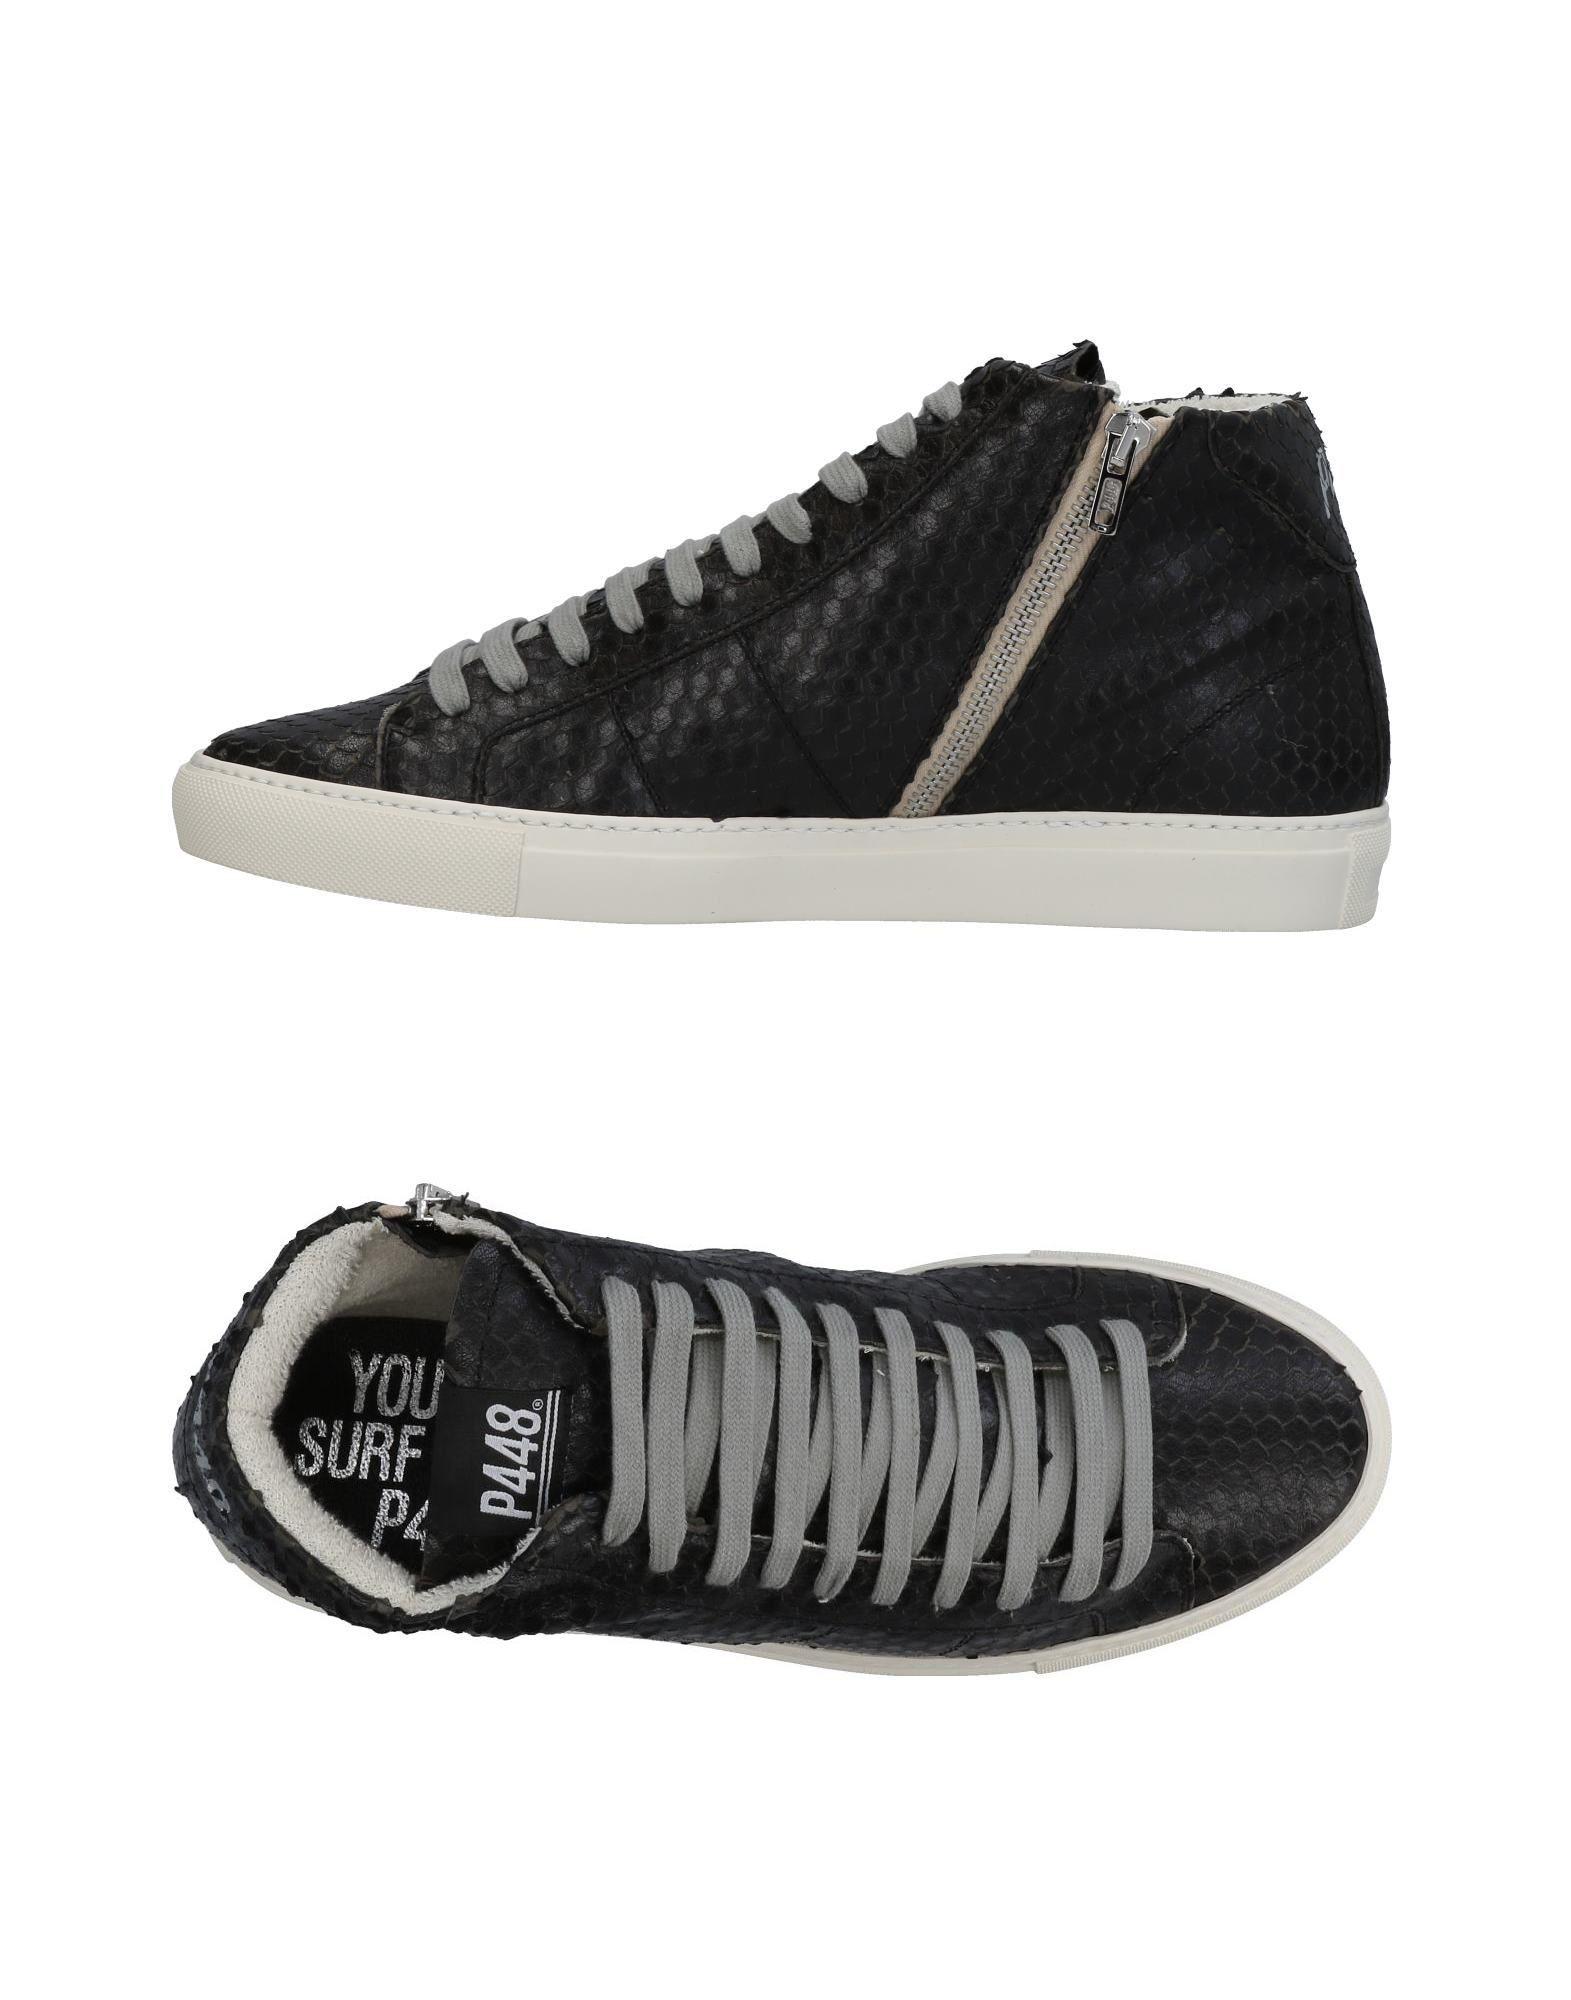 P448 Sneakers - on Men P448 Sneakers online on -  Australia - 11457170SU 0892c6